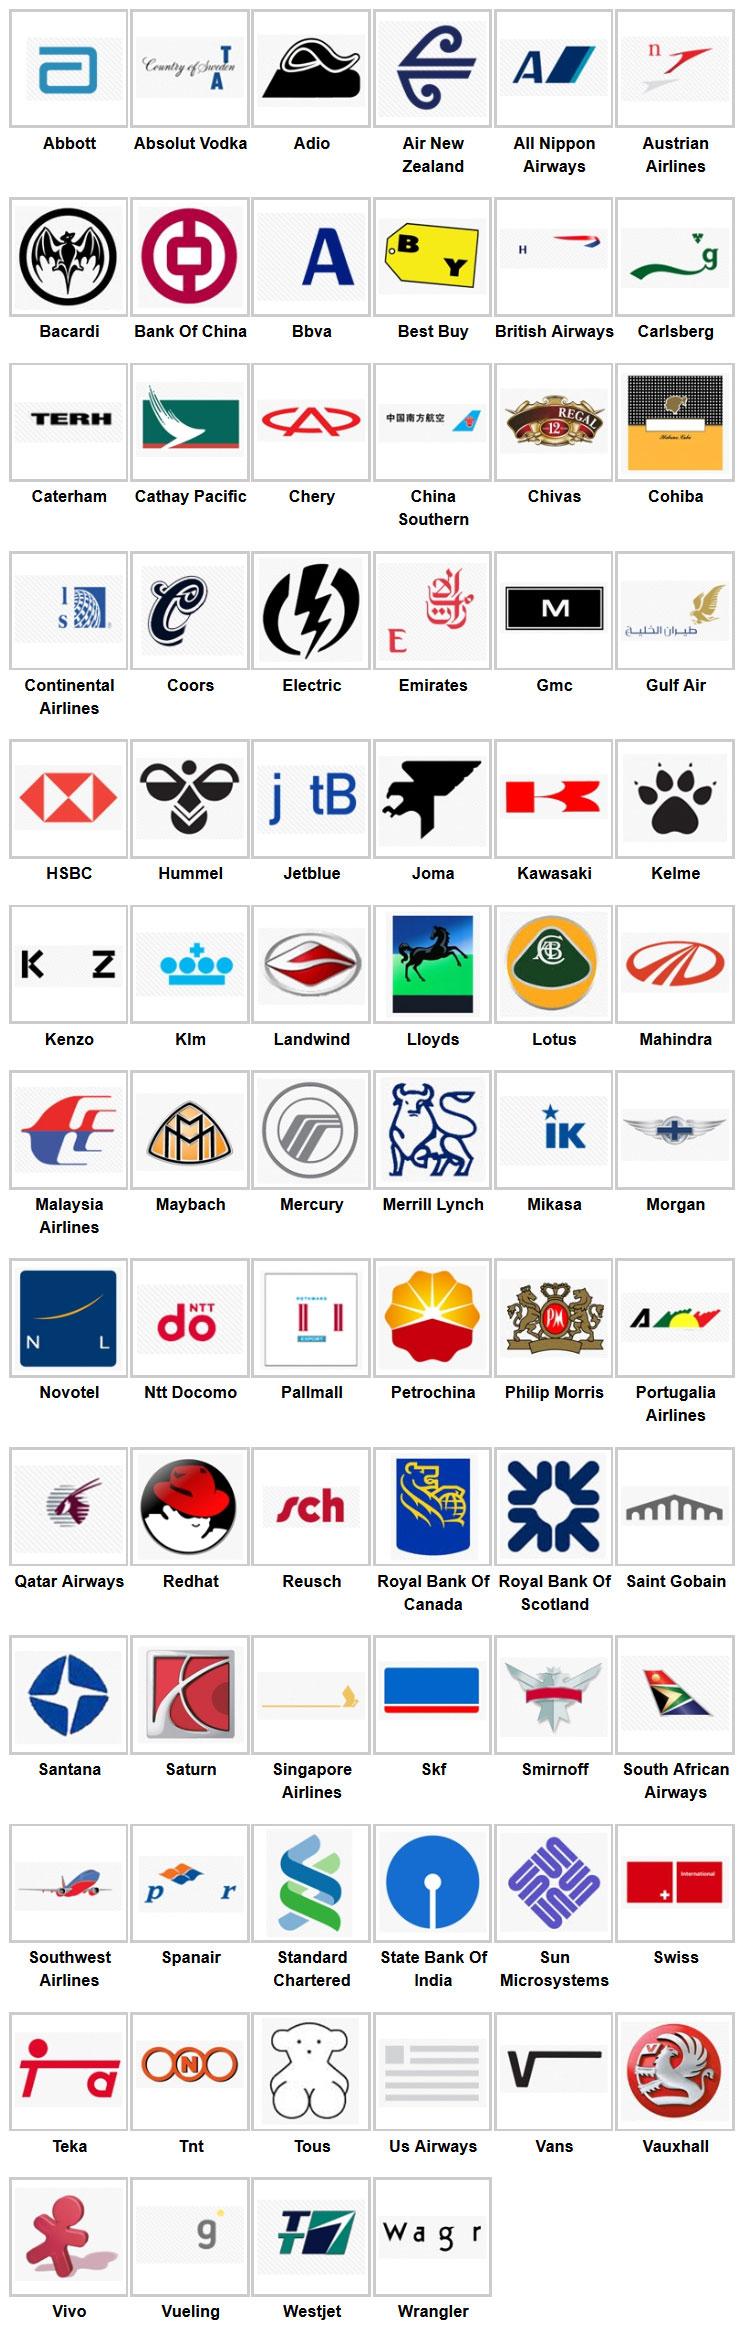 Logo quiz8 Logo quiz answers, Logo quiz, Game logo